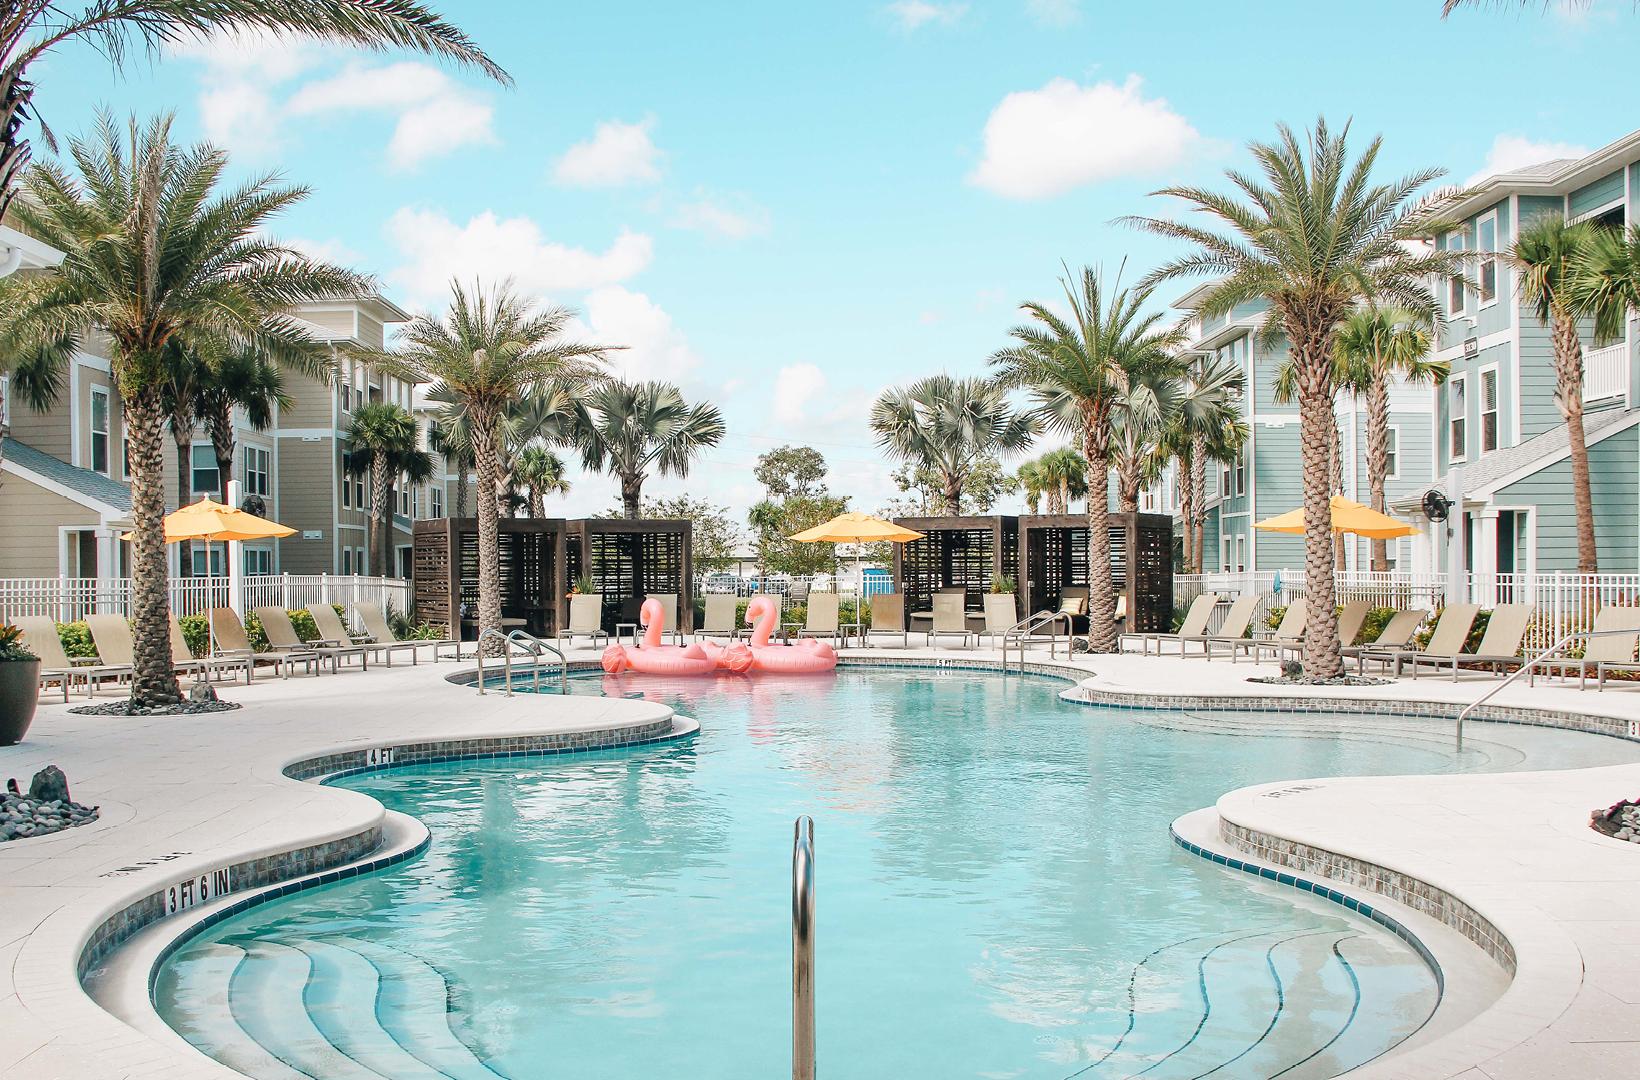 Orlando_Property_1.jpg